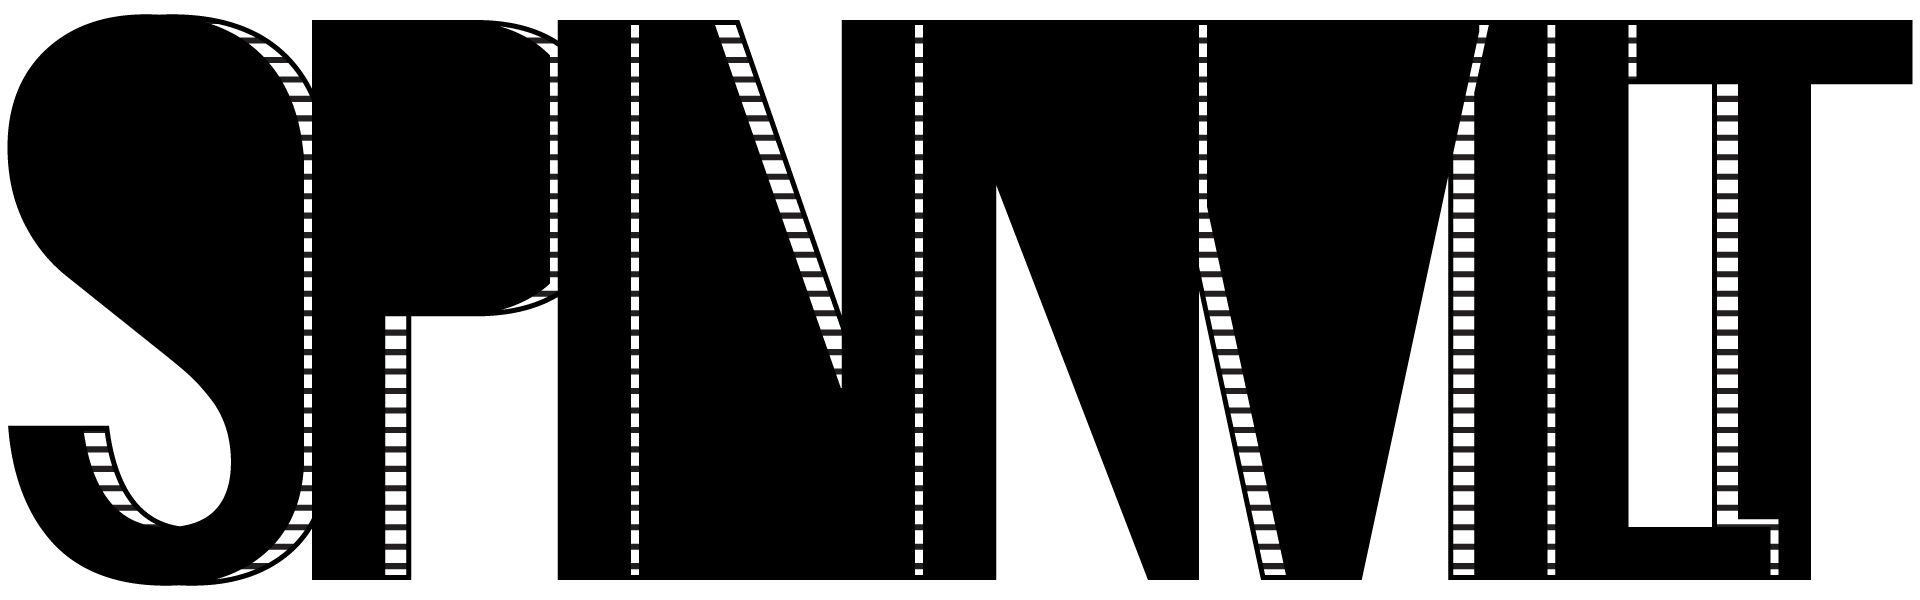 spinnvilt01-1920x600.png